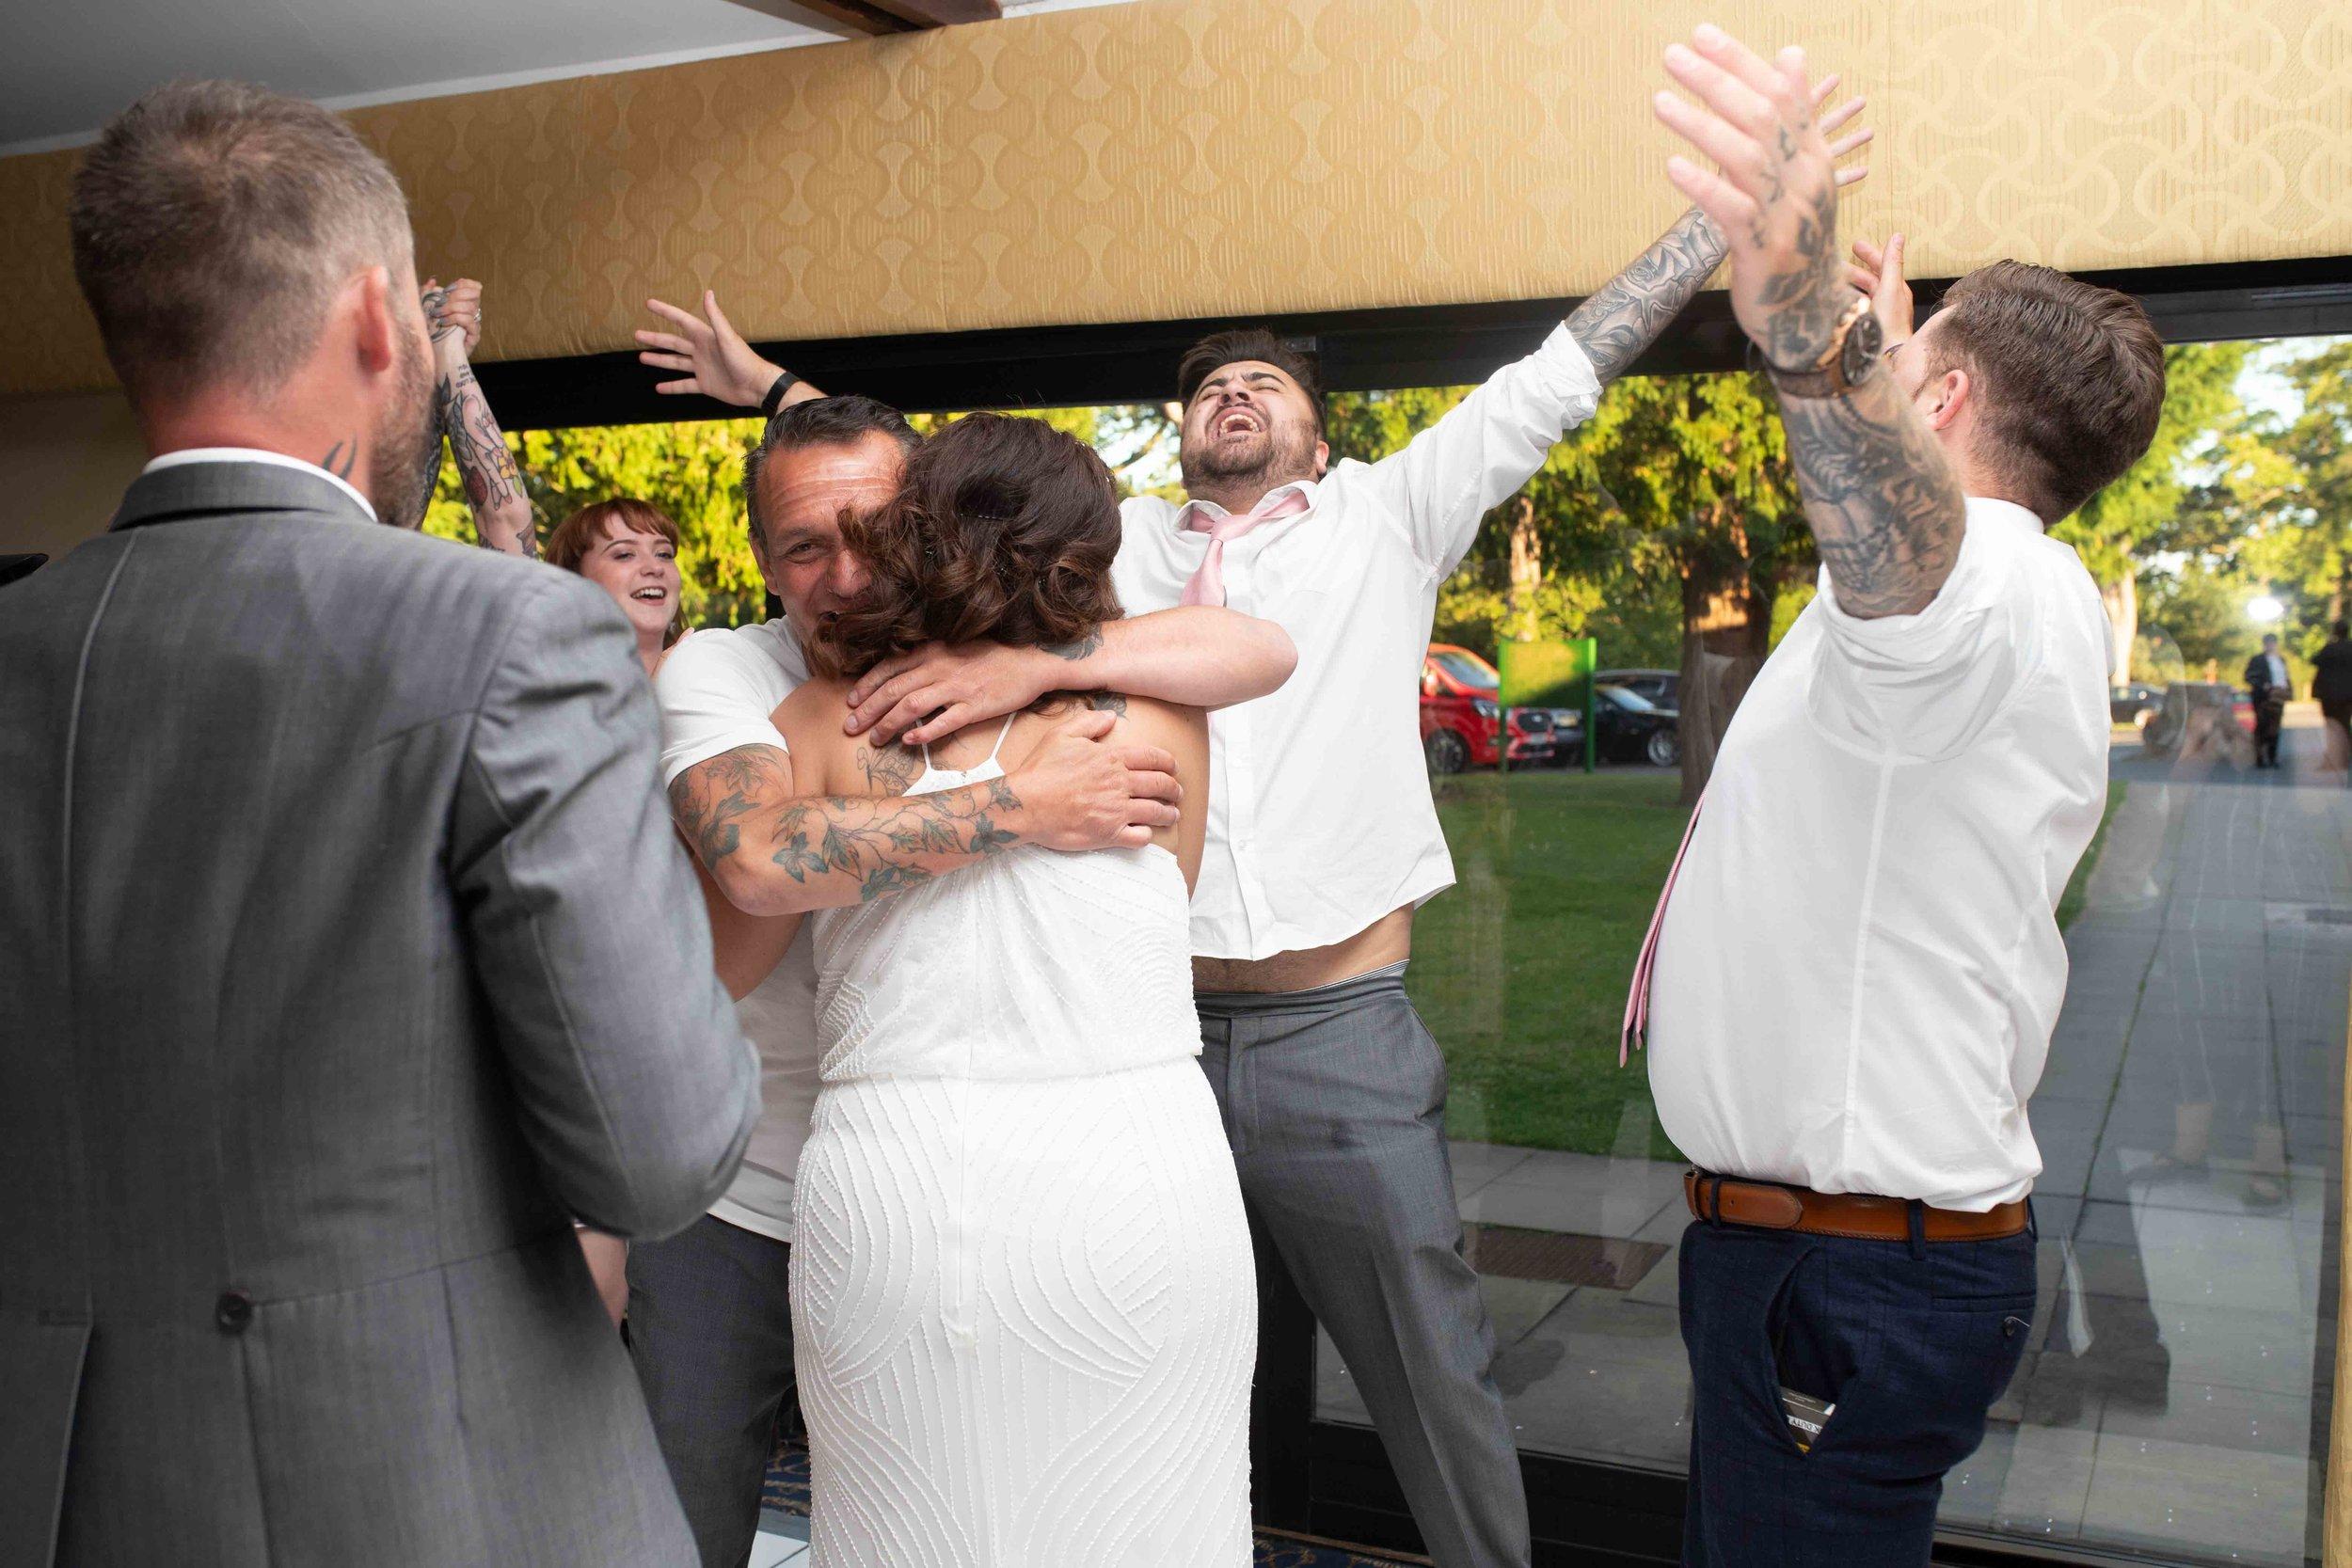 Lea-cooper-photography-wedding-photography-wolverhampton-patshull-park-hotel-wedding-pattingham-wolverhampton-west-midlands-uk-37.JPG